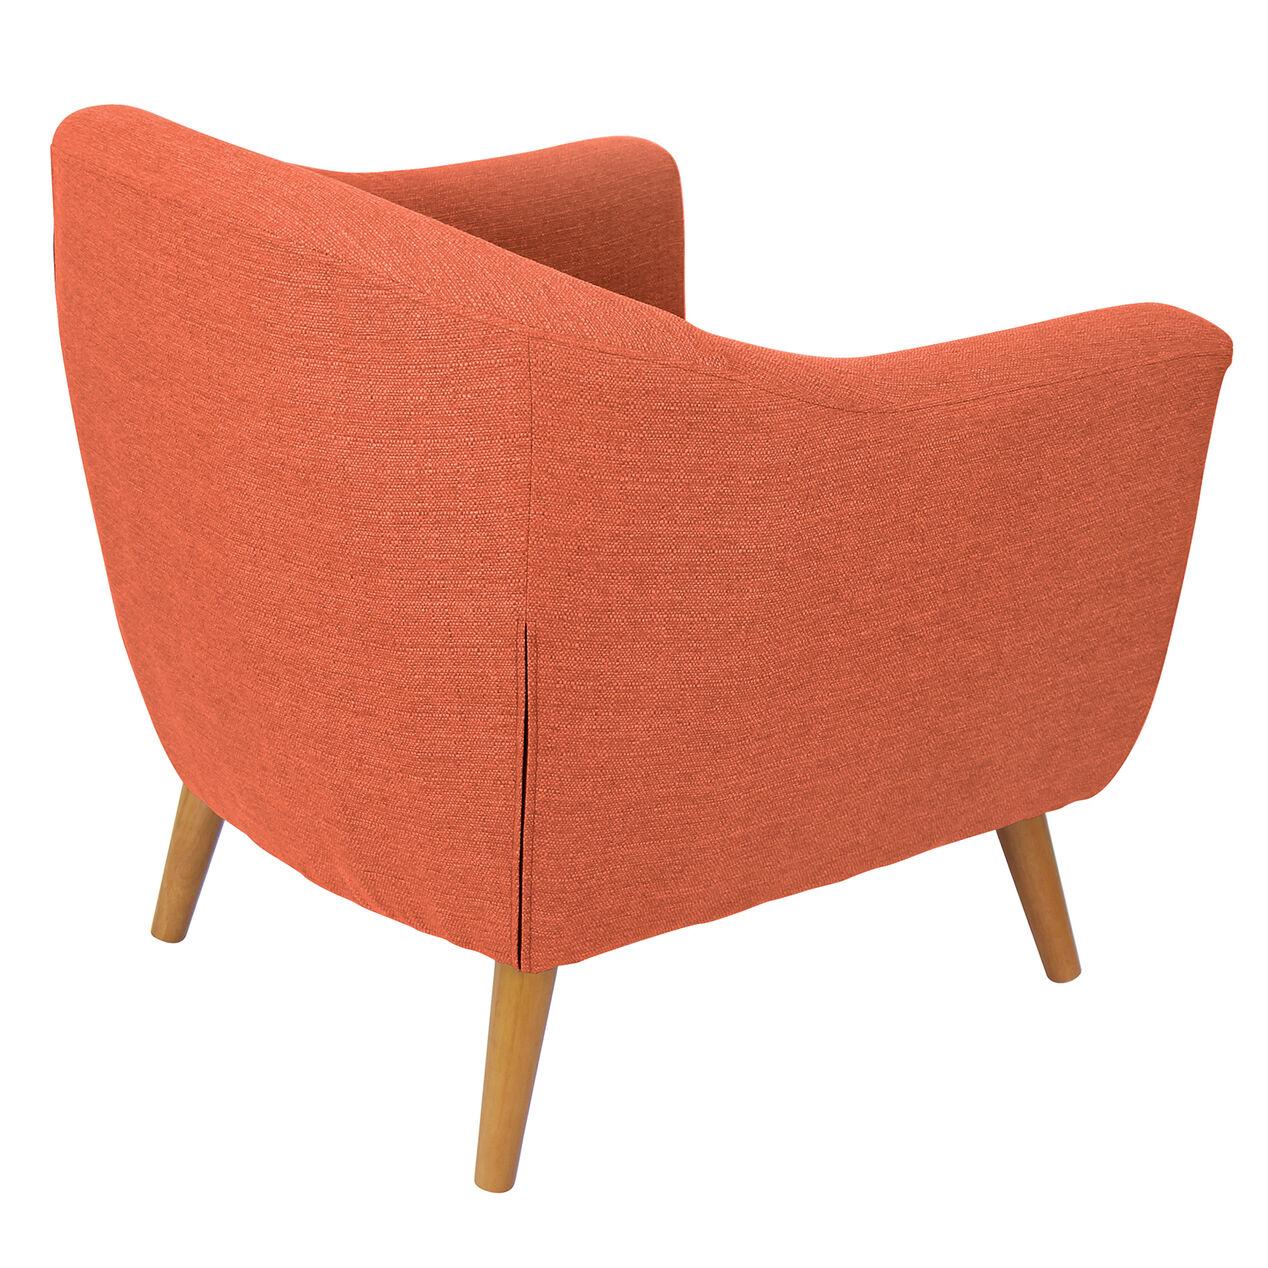 Orange accent chair -  Rockwell Accent Chair Orange